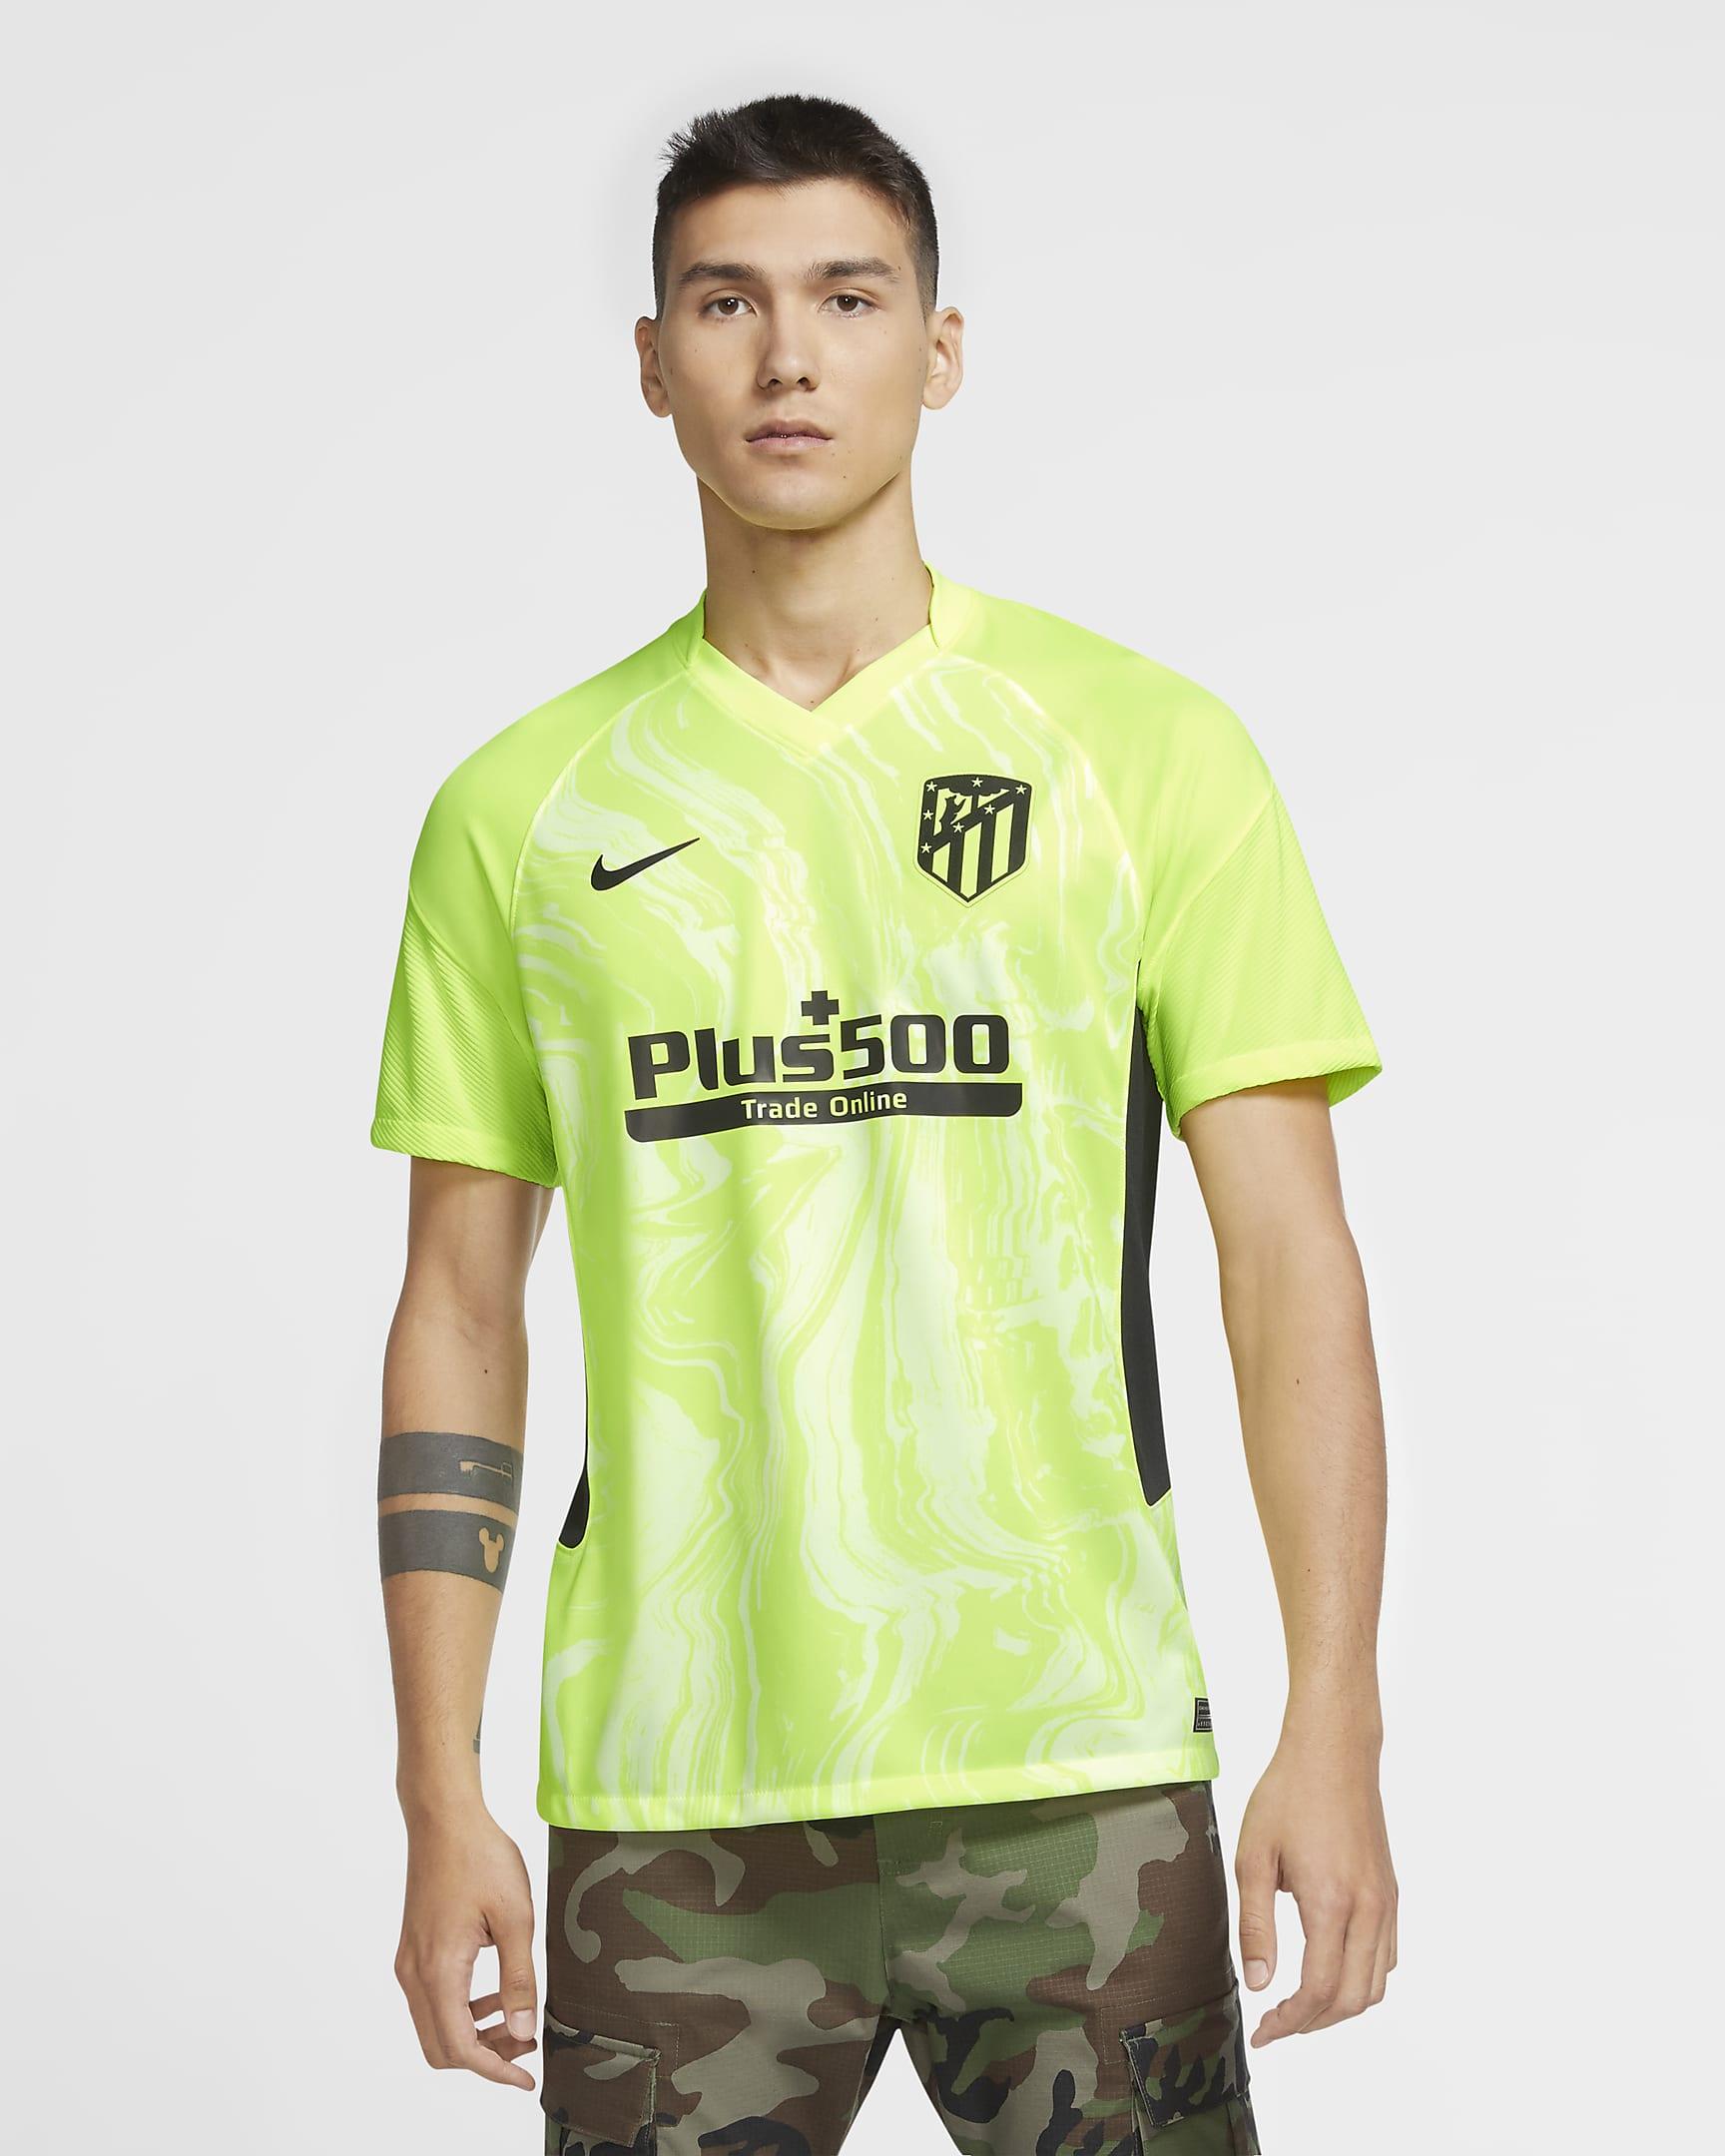 atletico, derde shirt, nike air max, sneakers